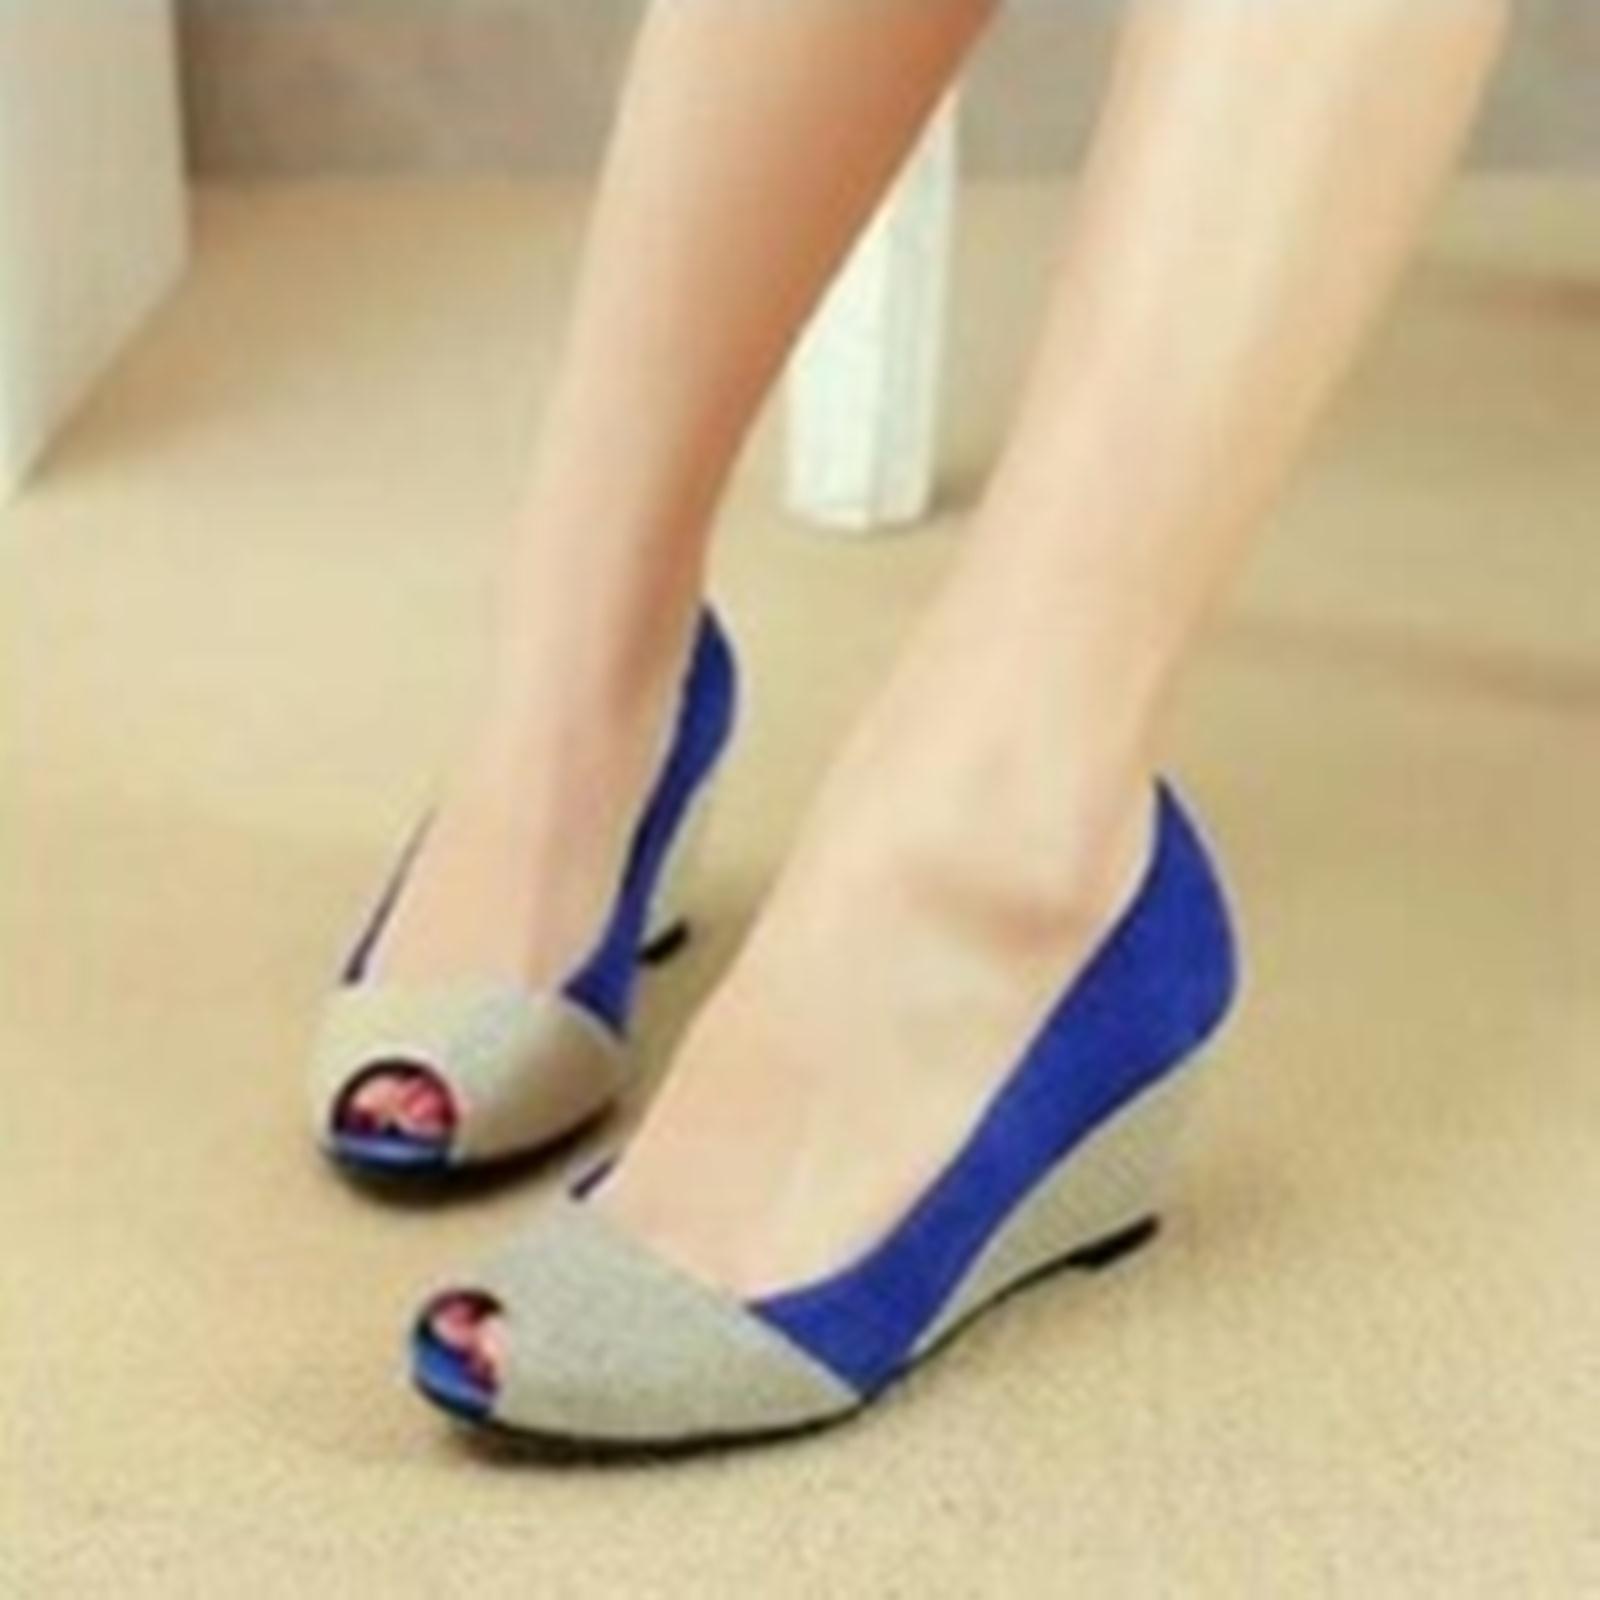 Sepatu Wedges Kerja Pesta Glitter Electric Blue / Biru Diskon